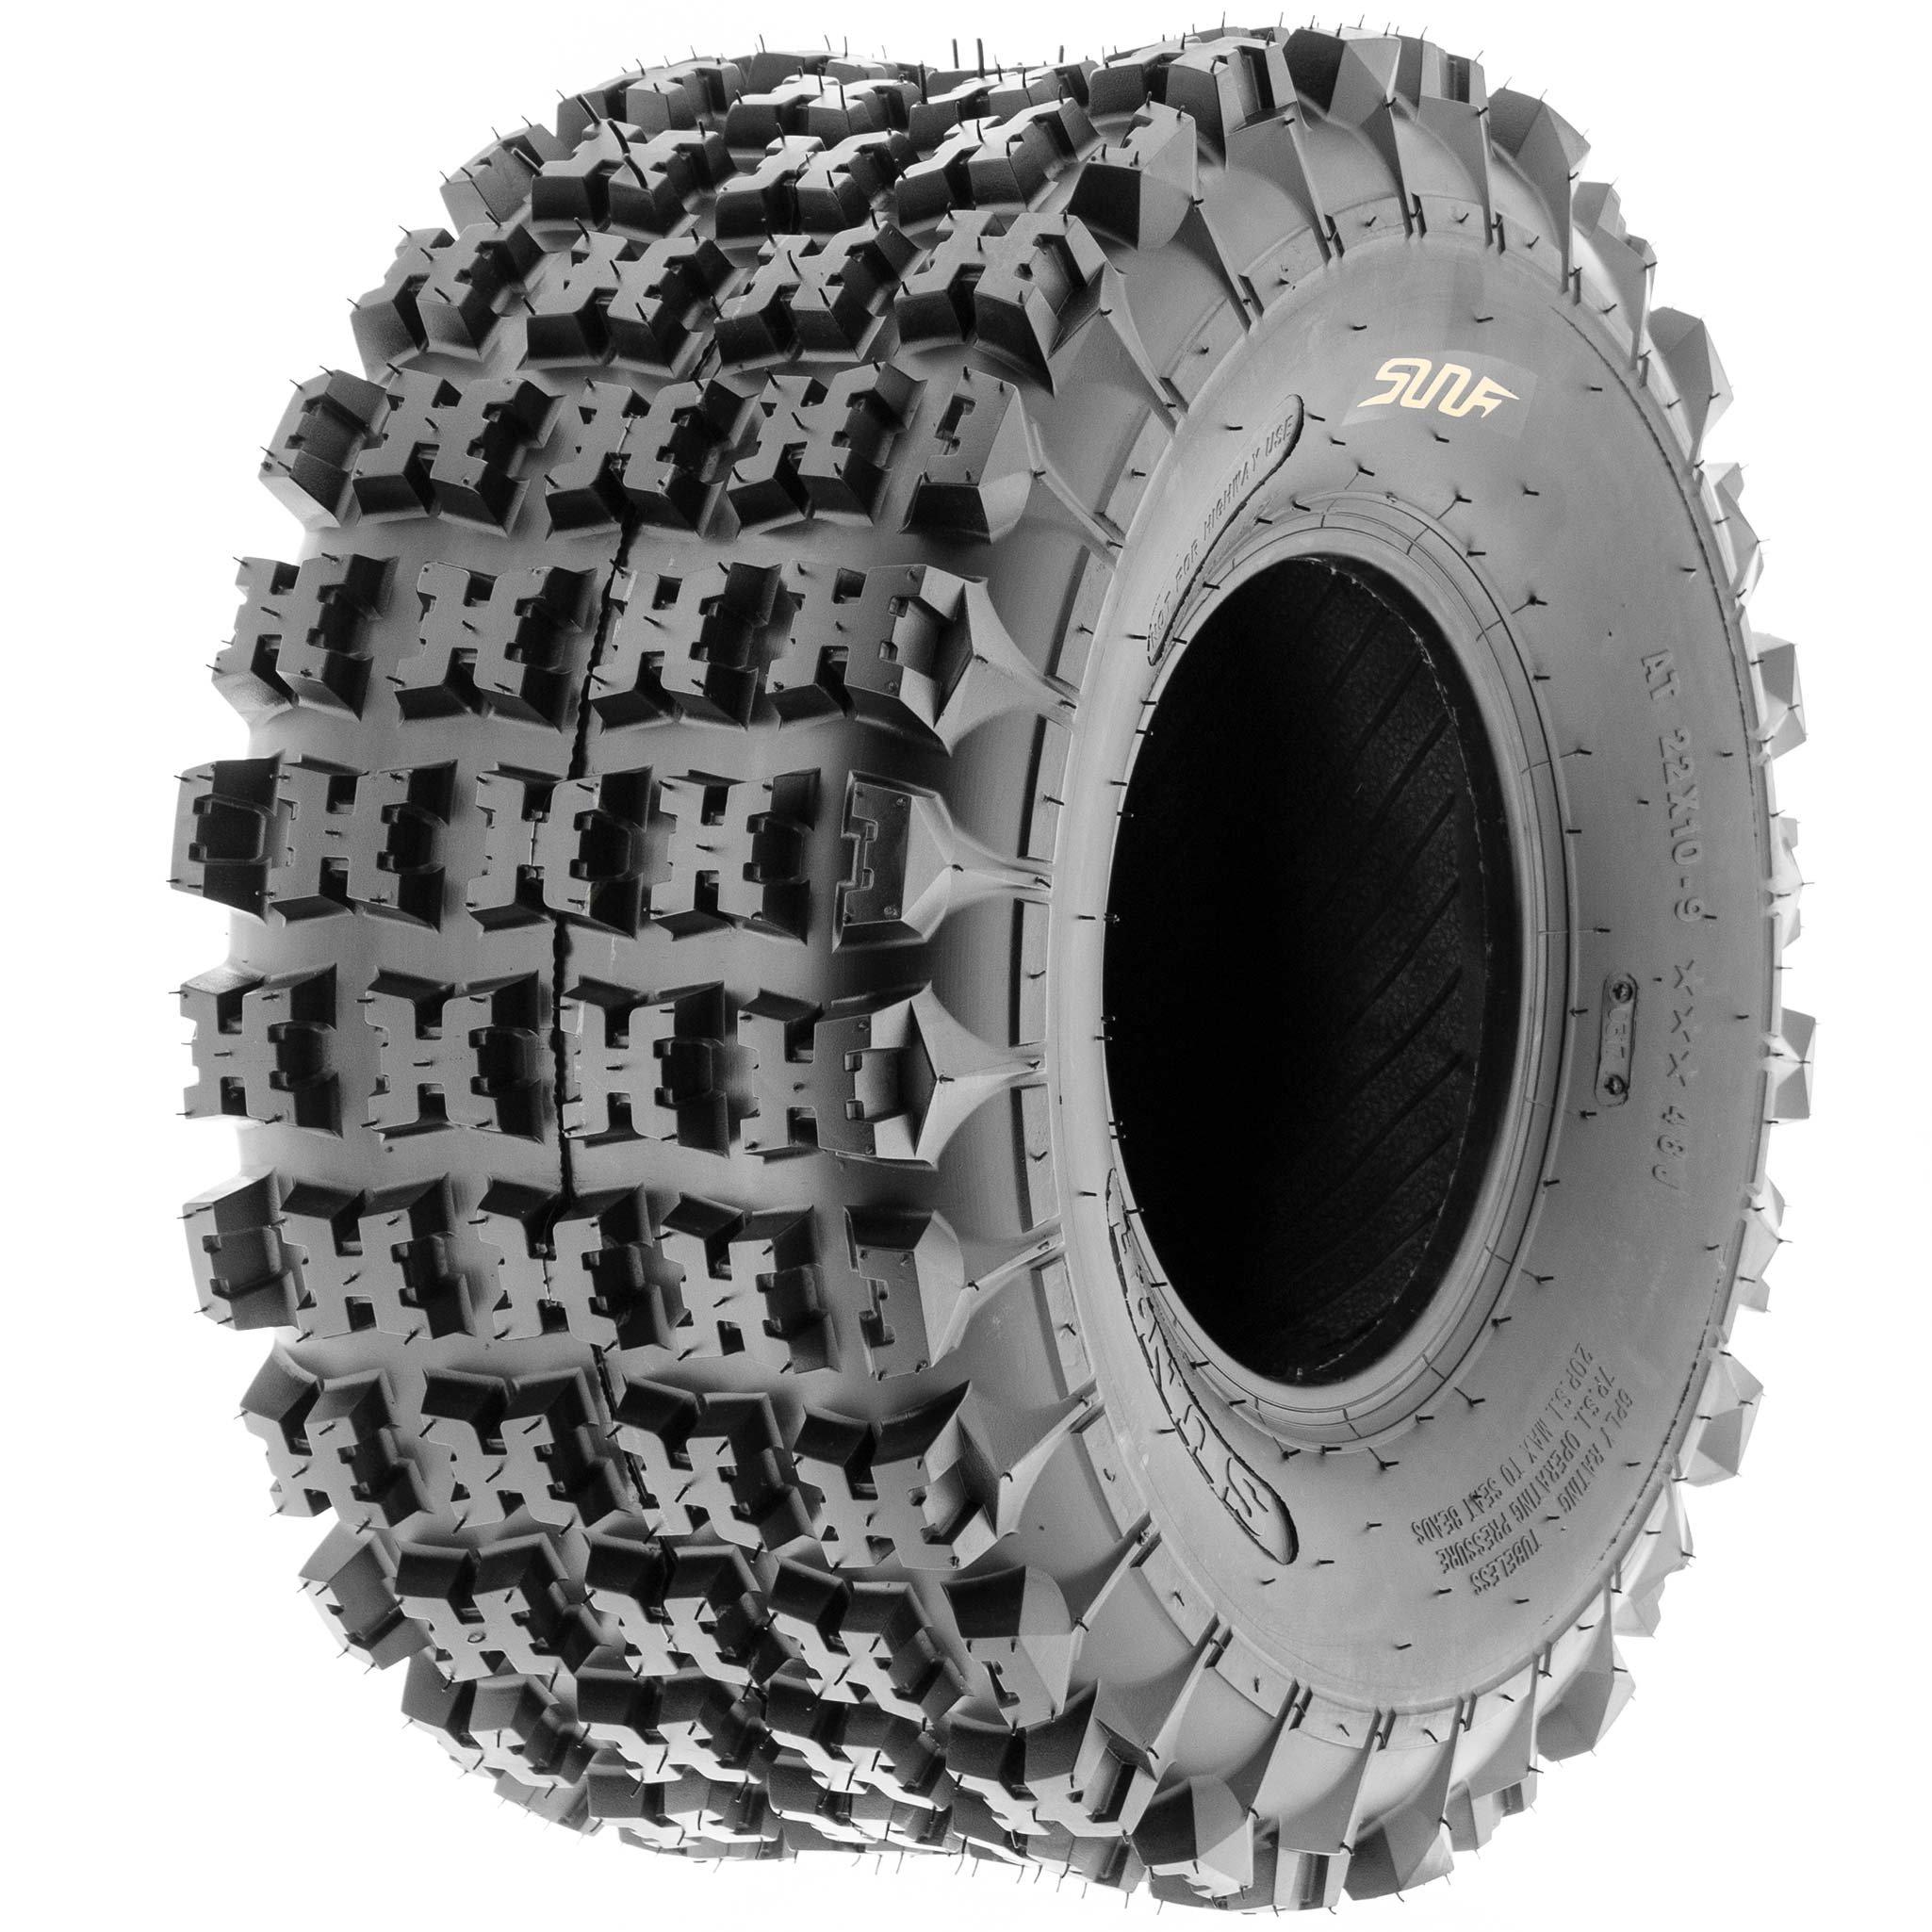 SunF 18x10.5-8 18x10.5x8 ATV UTV All Terrain Race Replacement 6 PR Tubeless Tires A027, [Set of 2] by SunF (Image #9)